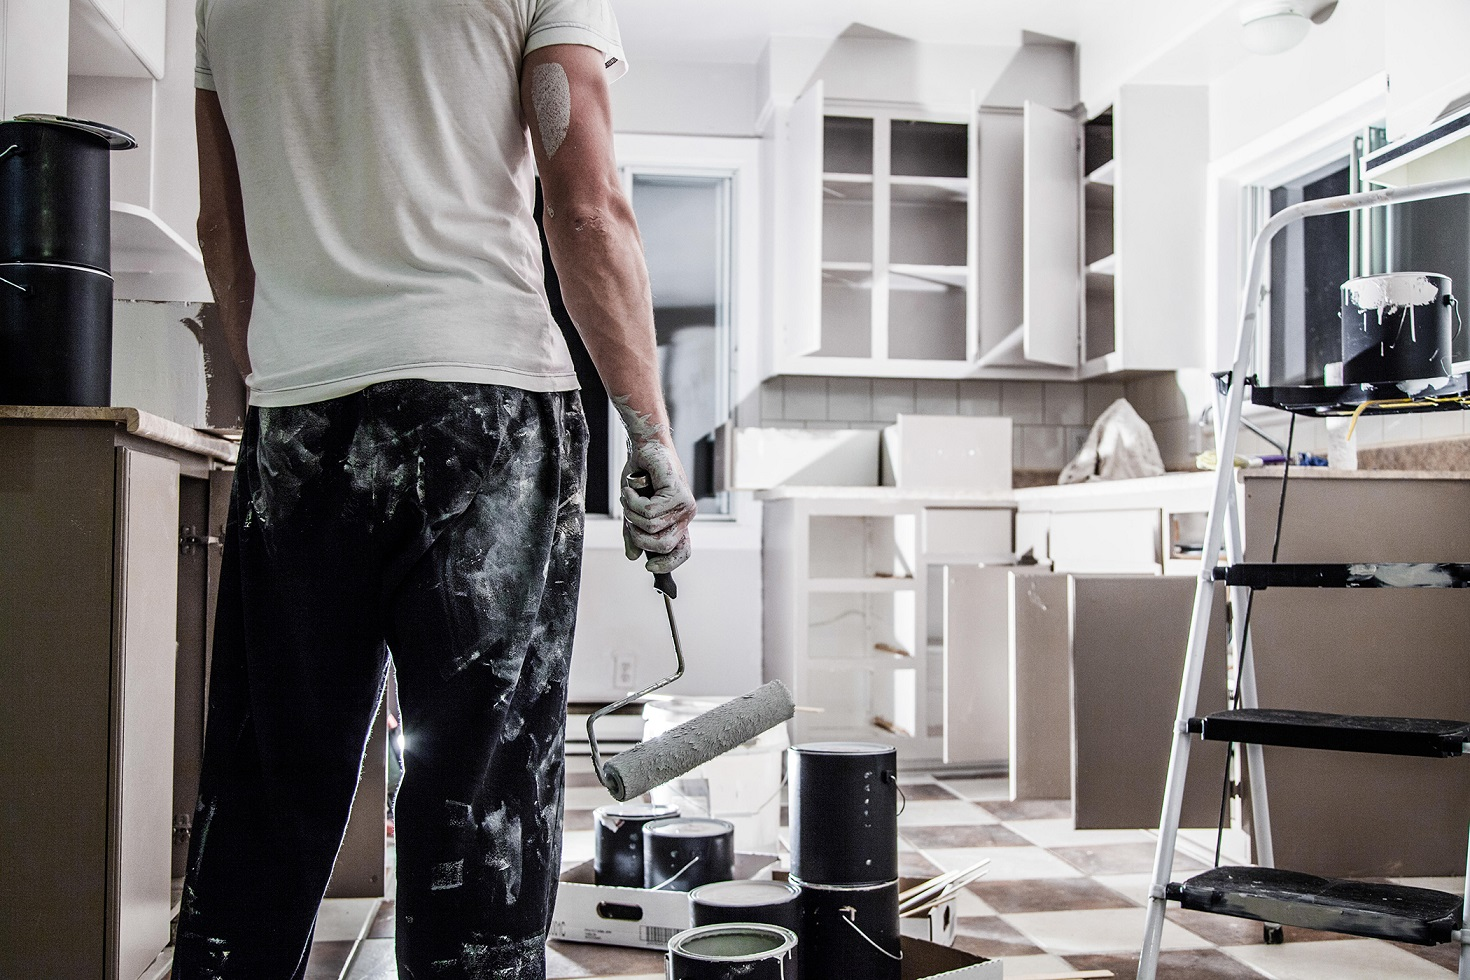 ремонт квартиры в Москве на сайте АСК Триан trian.tiu.ru